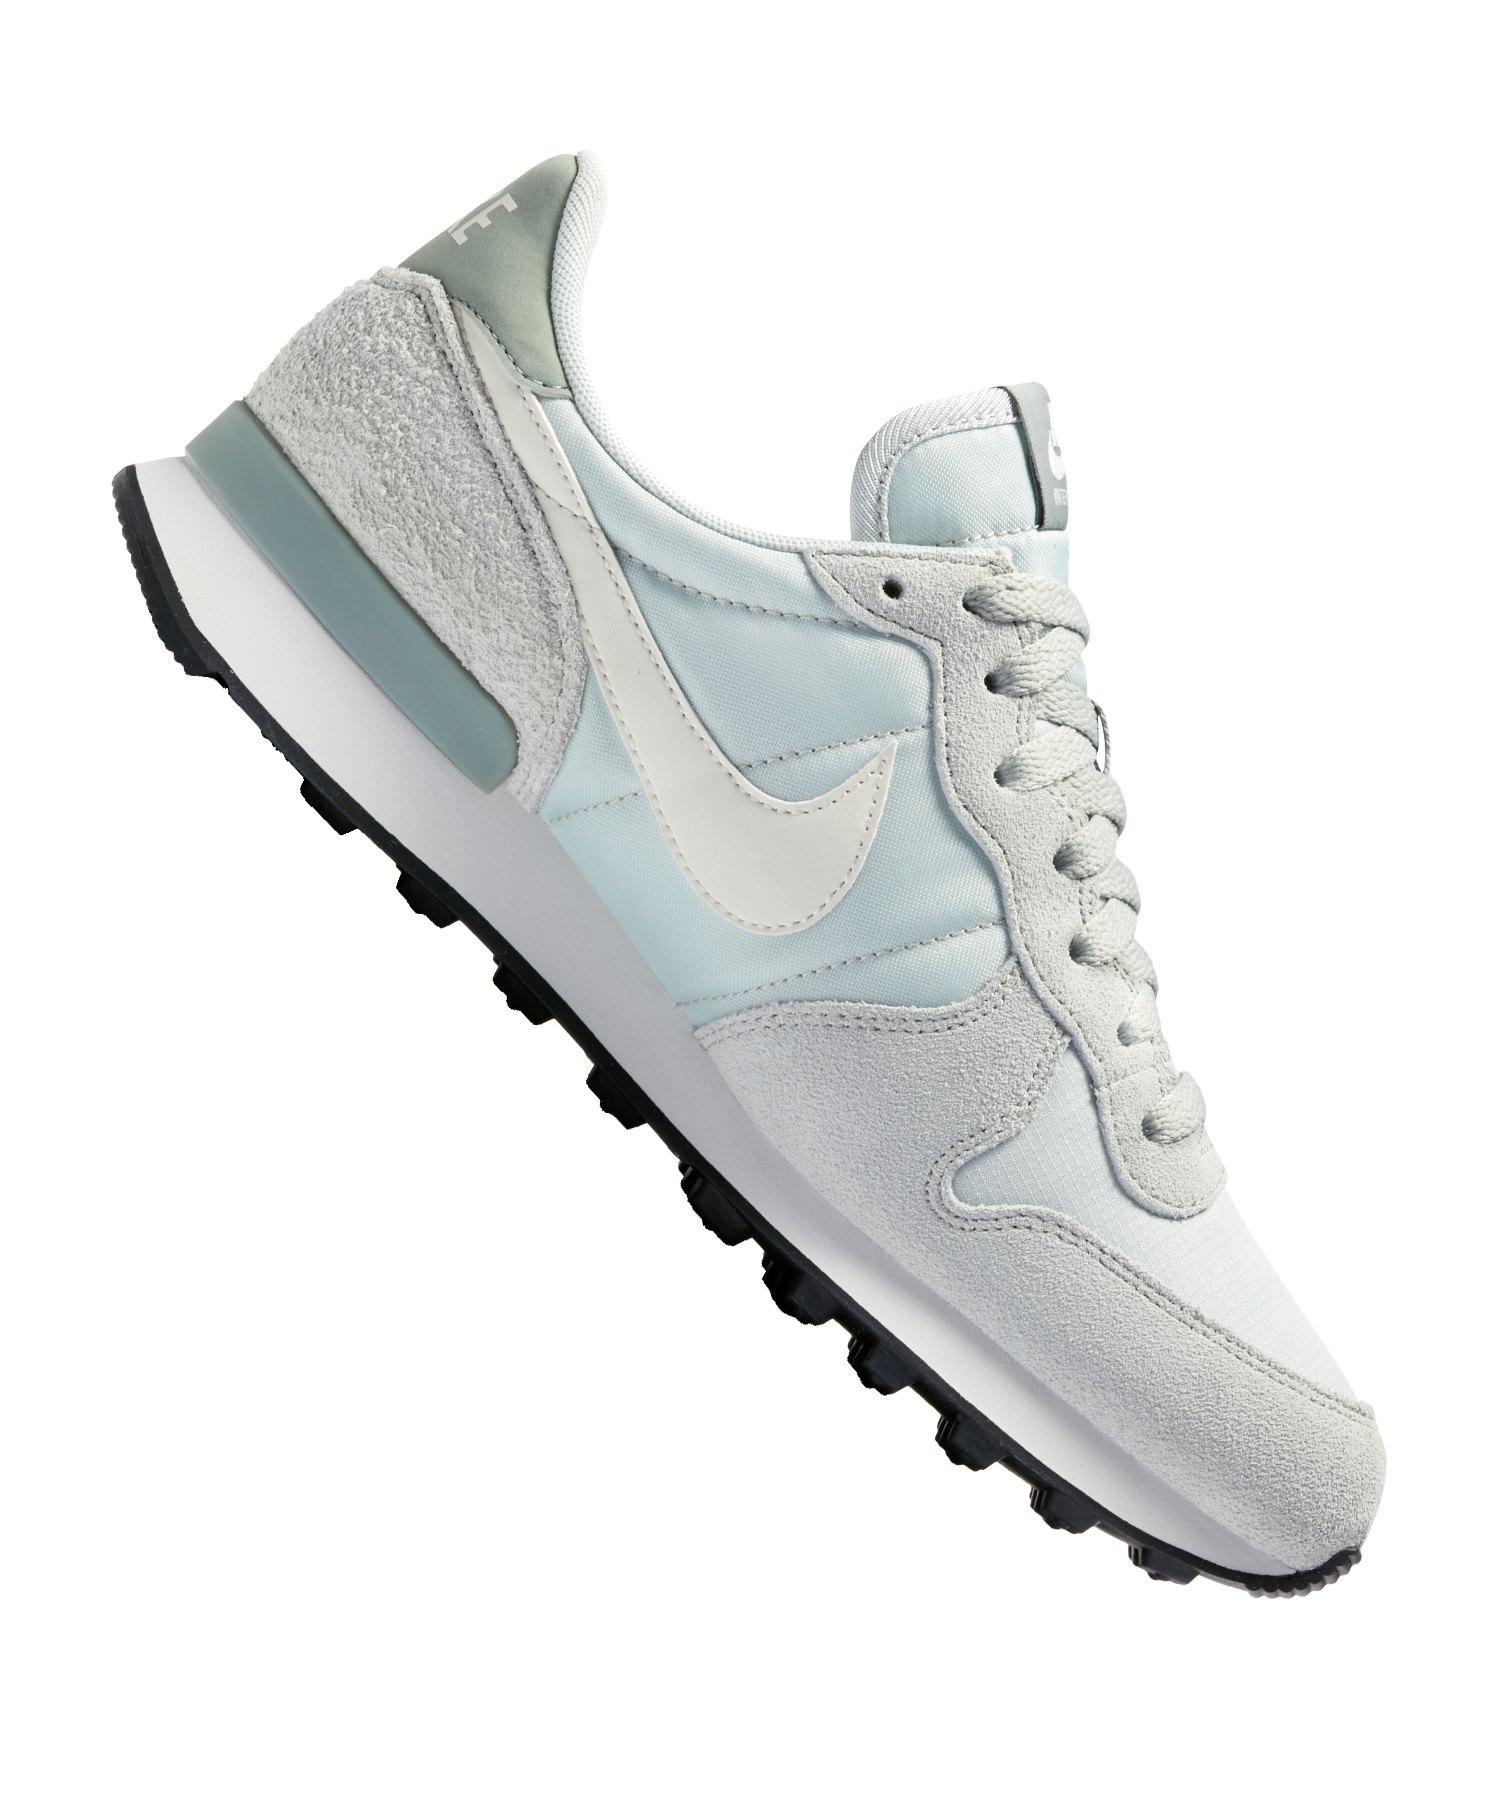 23e20635e0be Nike Internationalist Sneaker Damen Silber F025   Freizeit ...